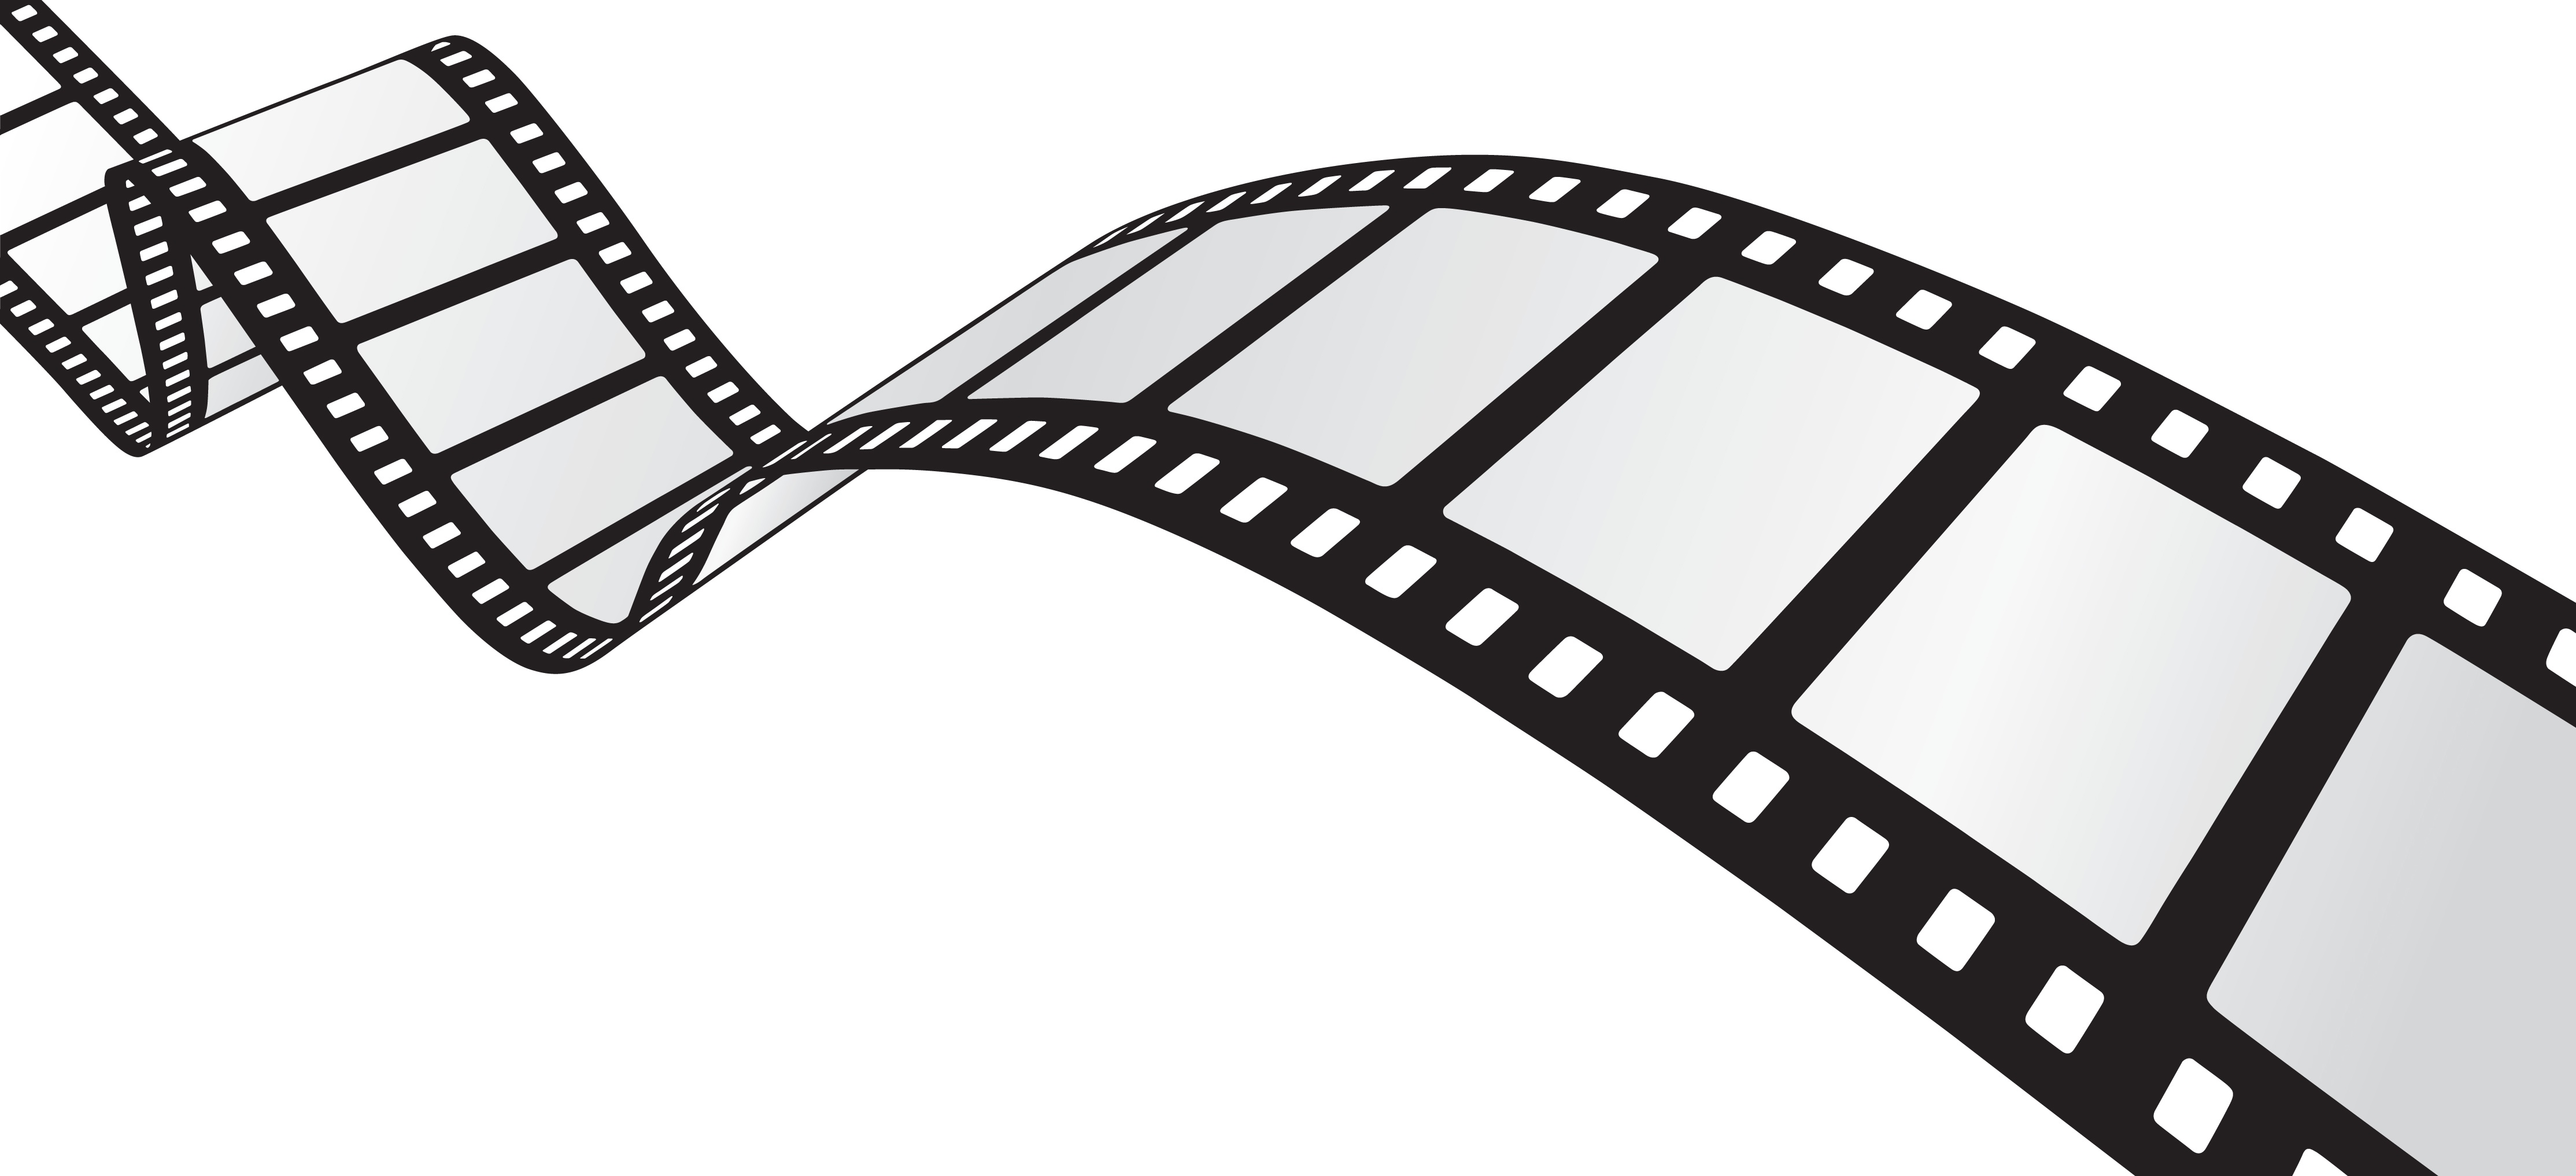 4455x2034 Color Movie Reel Clipart